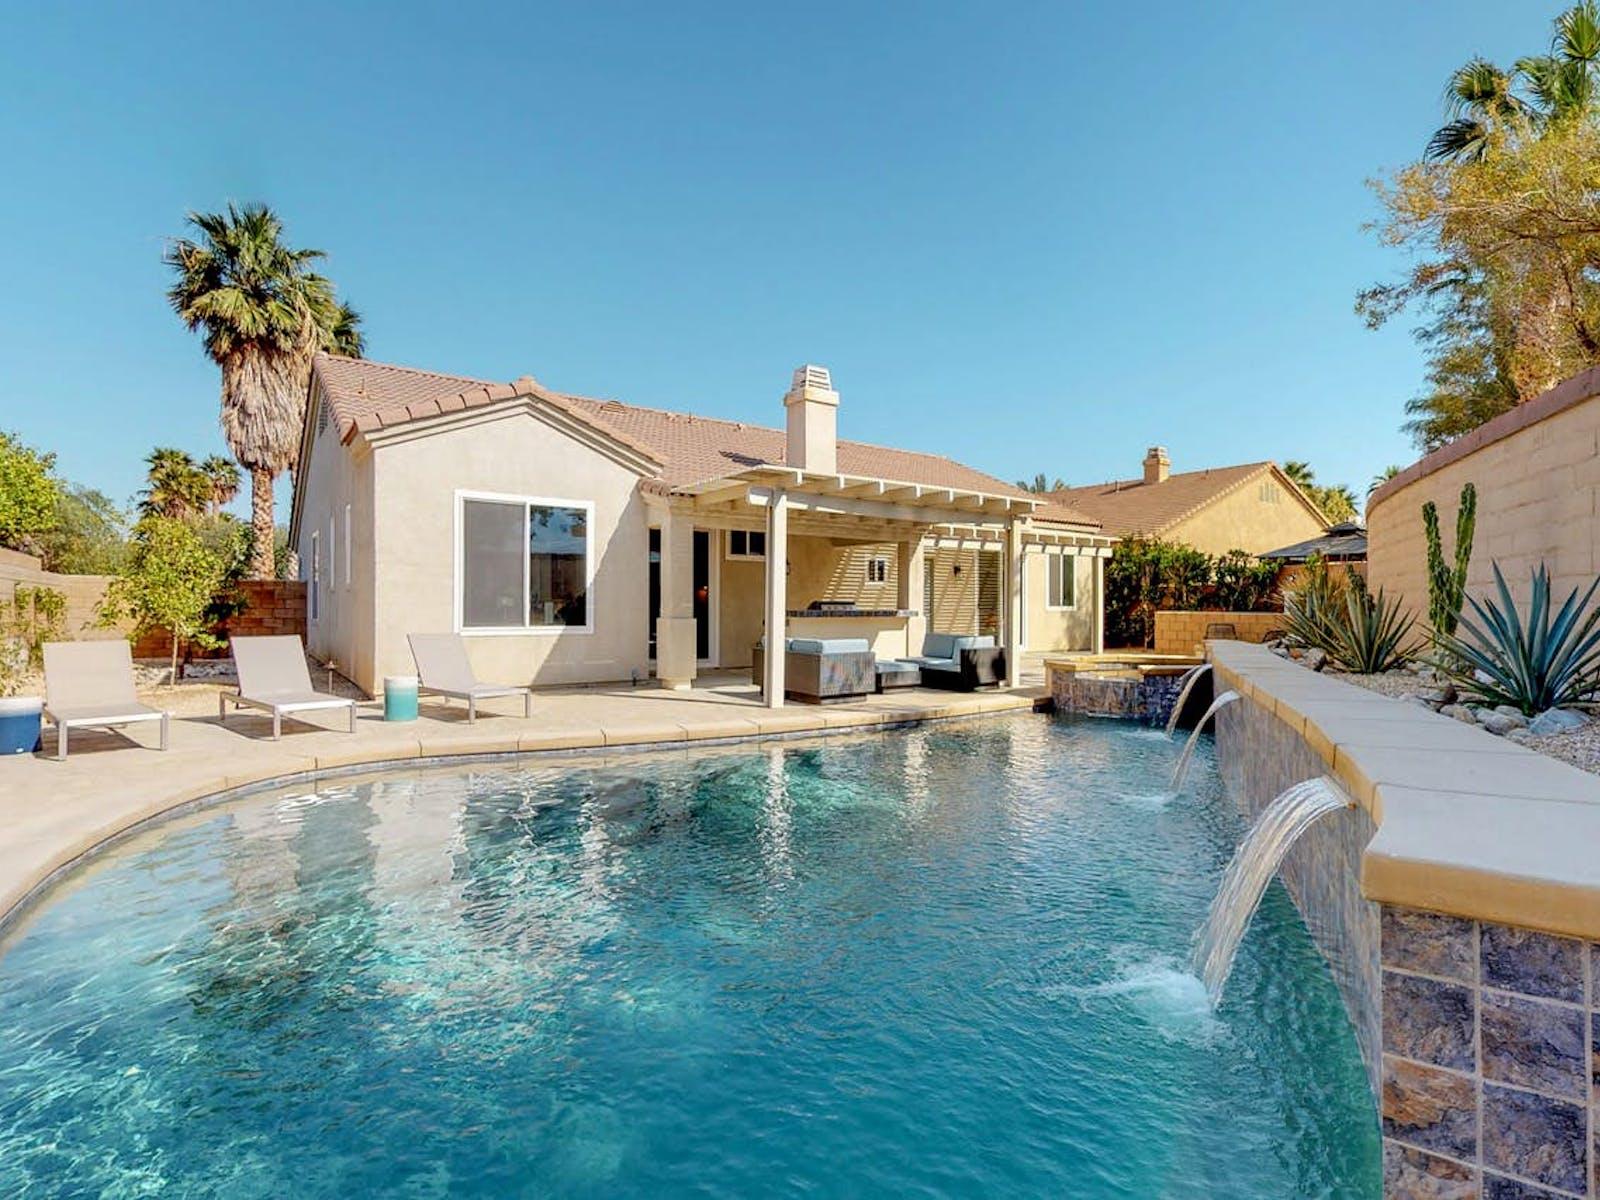 Outdoor pool in Palm Springs, CA